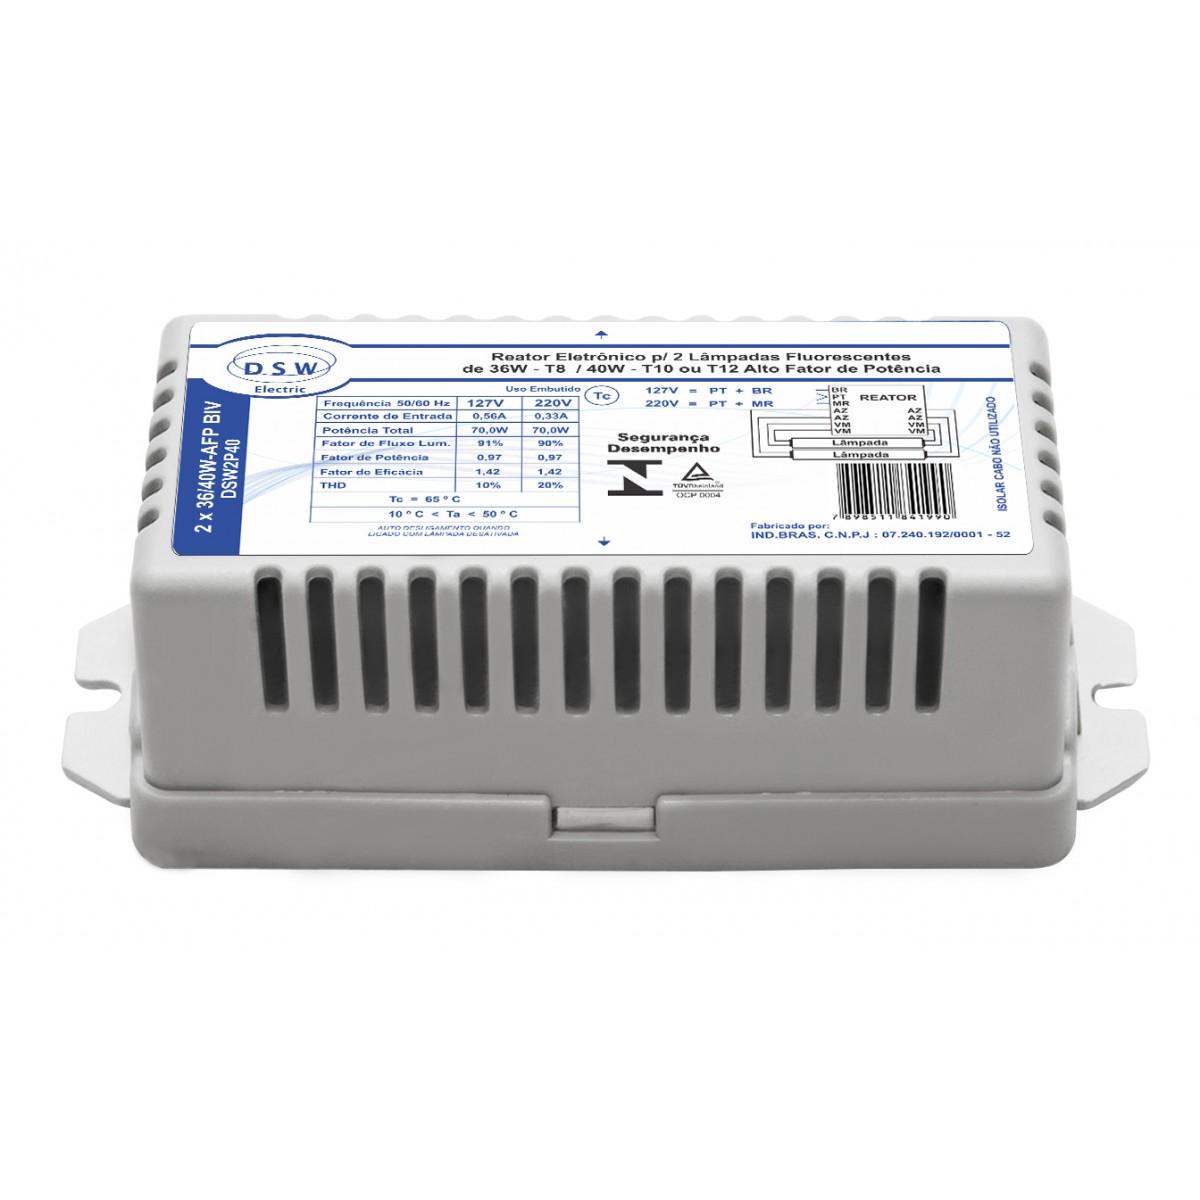 Reator Eletrônico 36W/40W Bivolt para 2 Lâmpadas Fluorescente